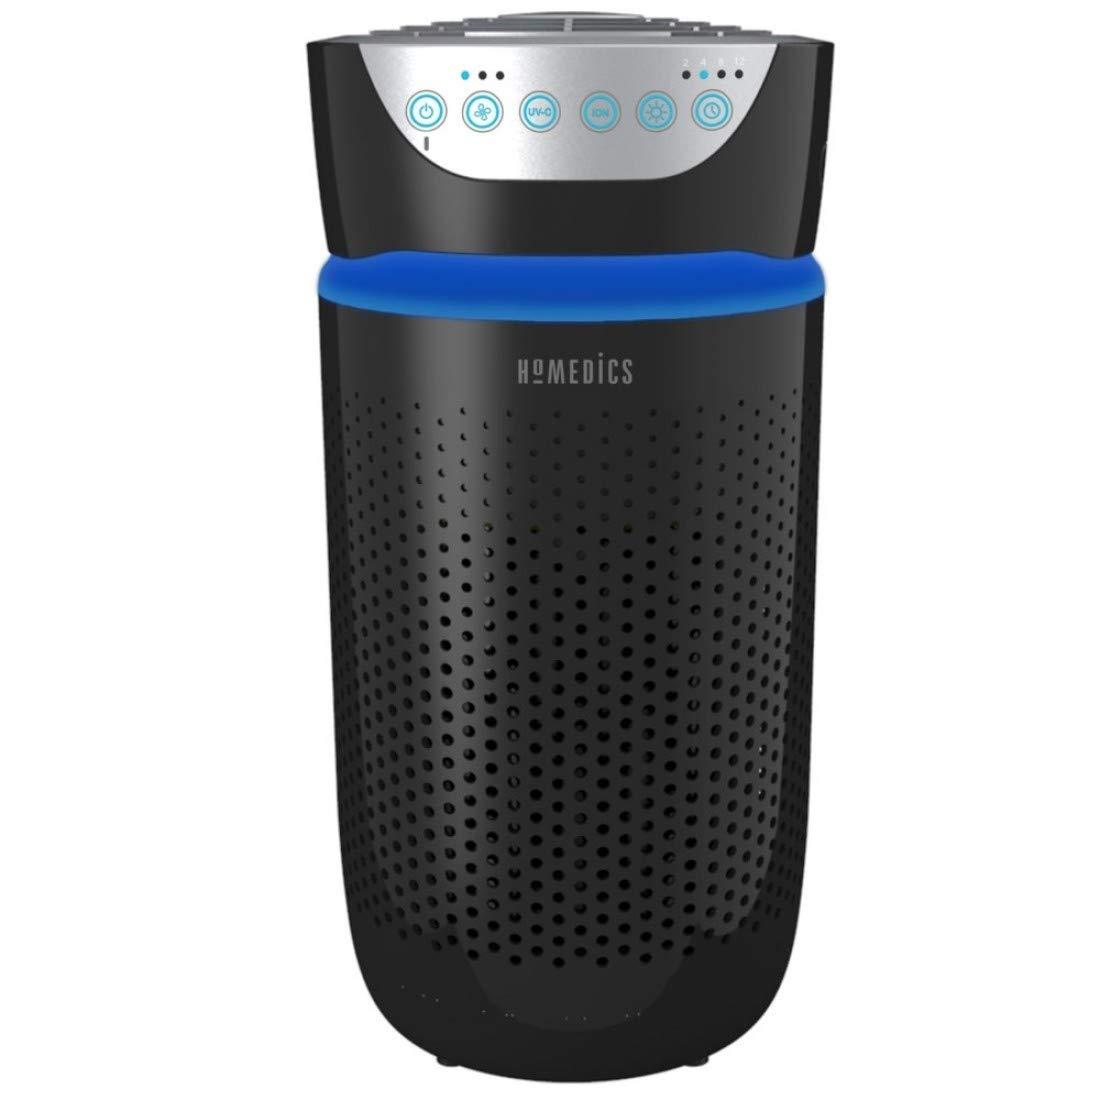 HOMEDICS 5 in 1 Total Clean AIR Purifier AP-T40BK-GB